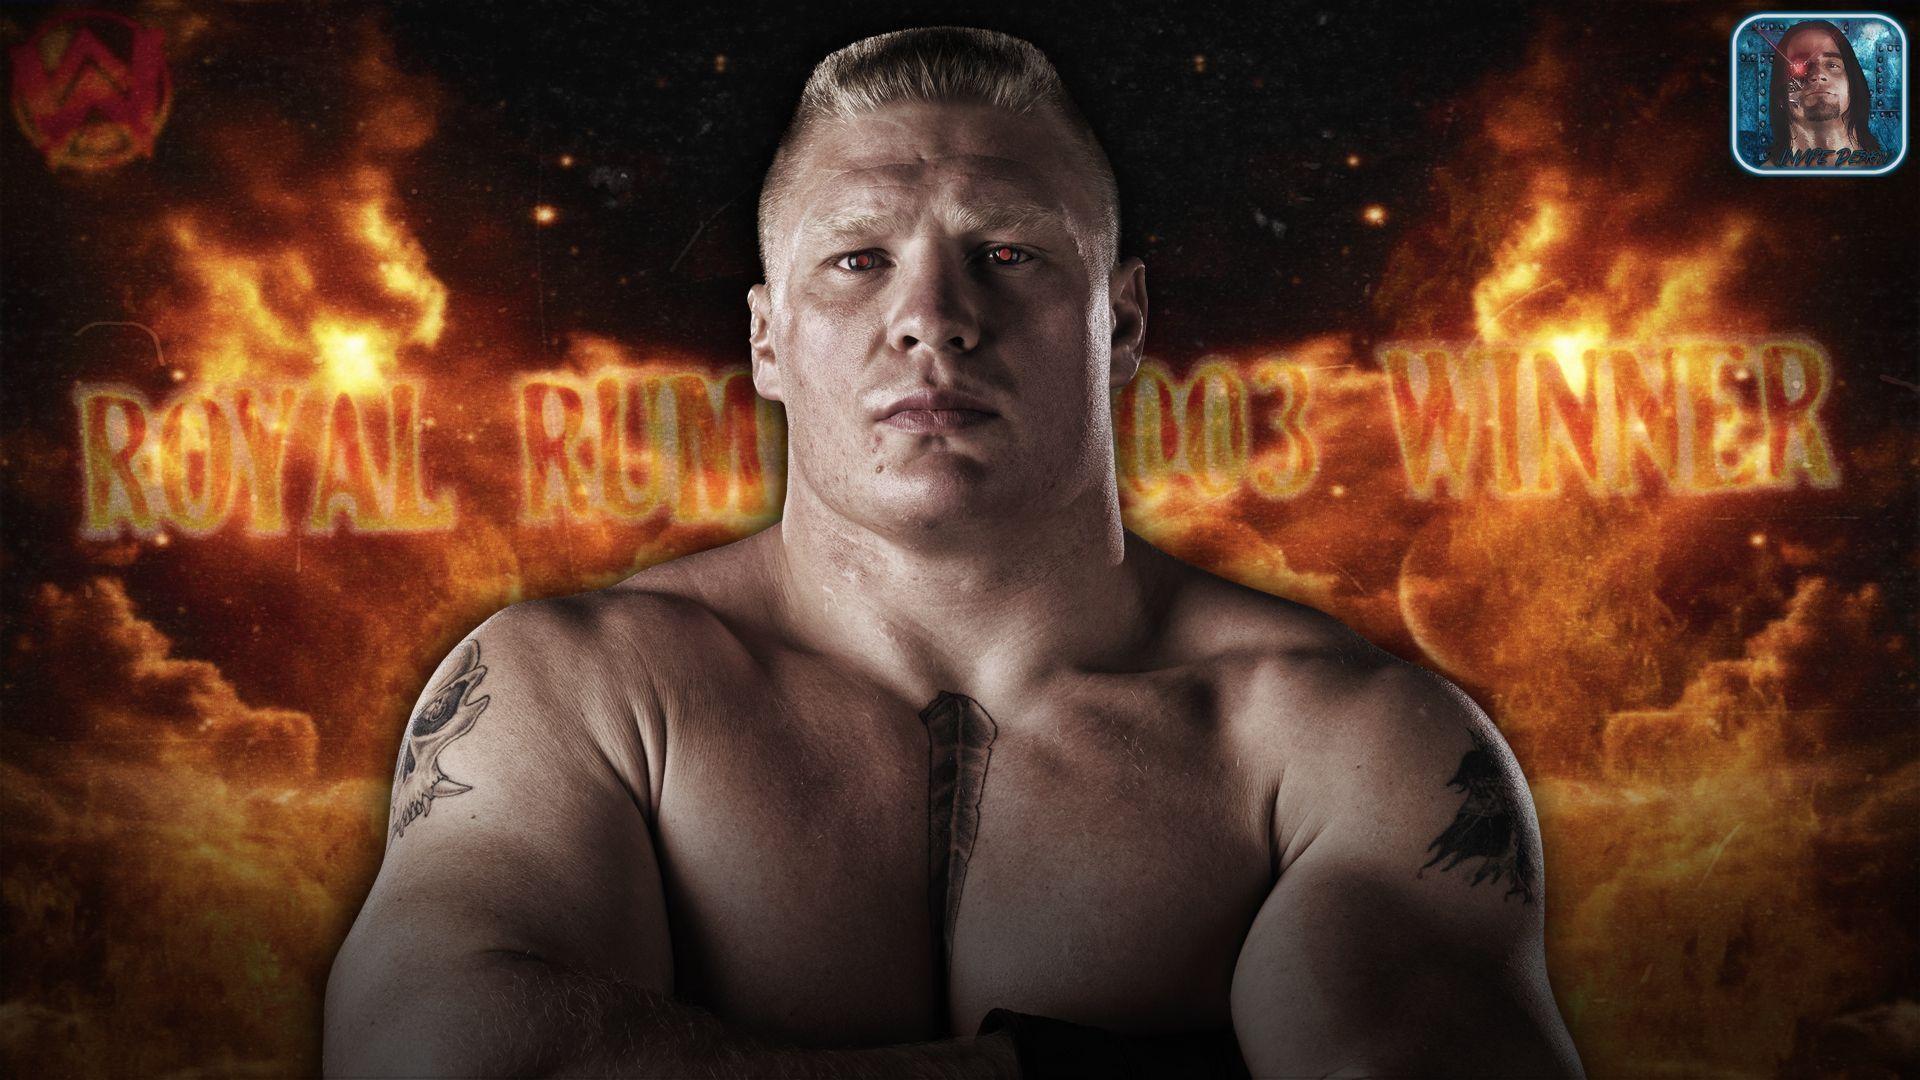 1920x1080 Wrestler Brock Lesnar In Fight HD Wallpaper For Computer